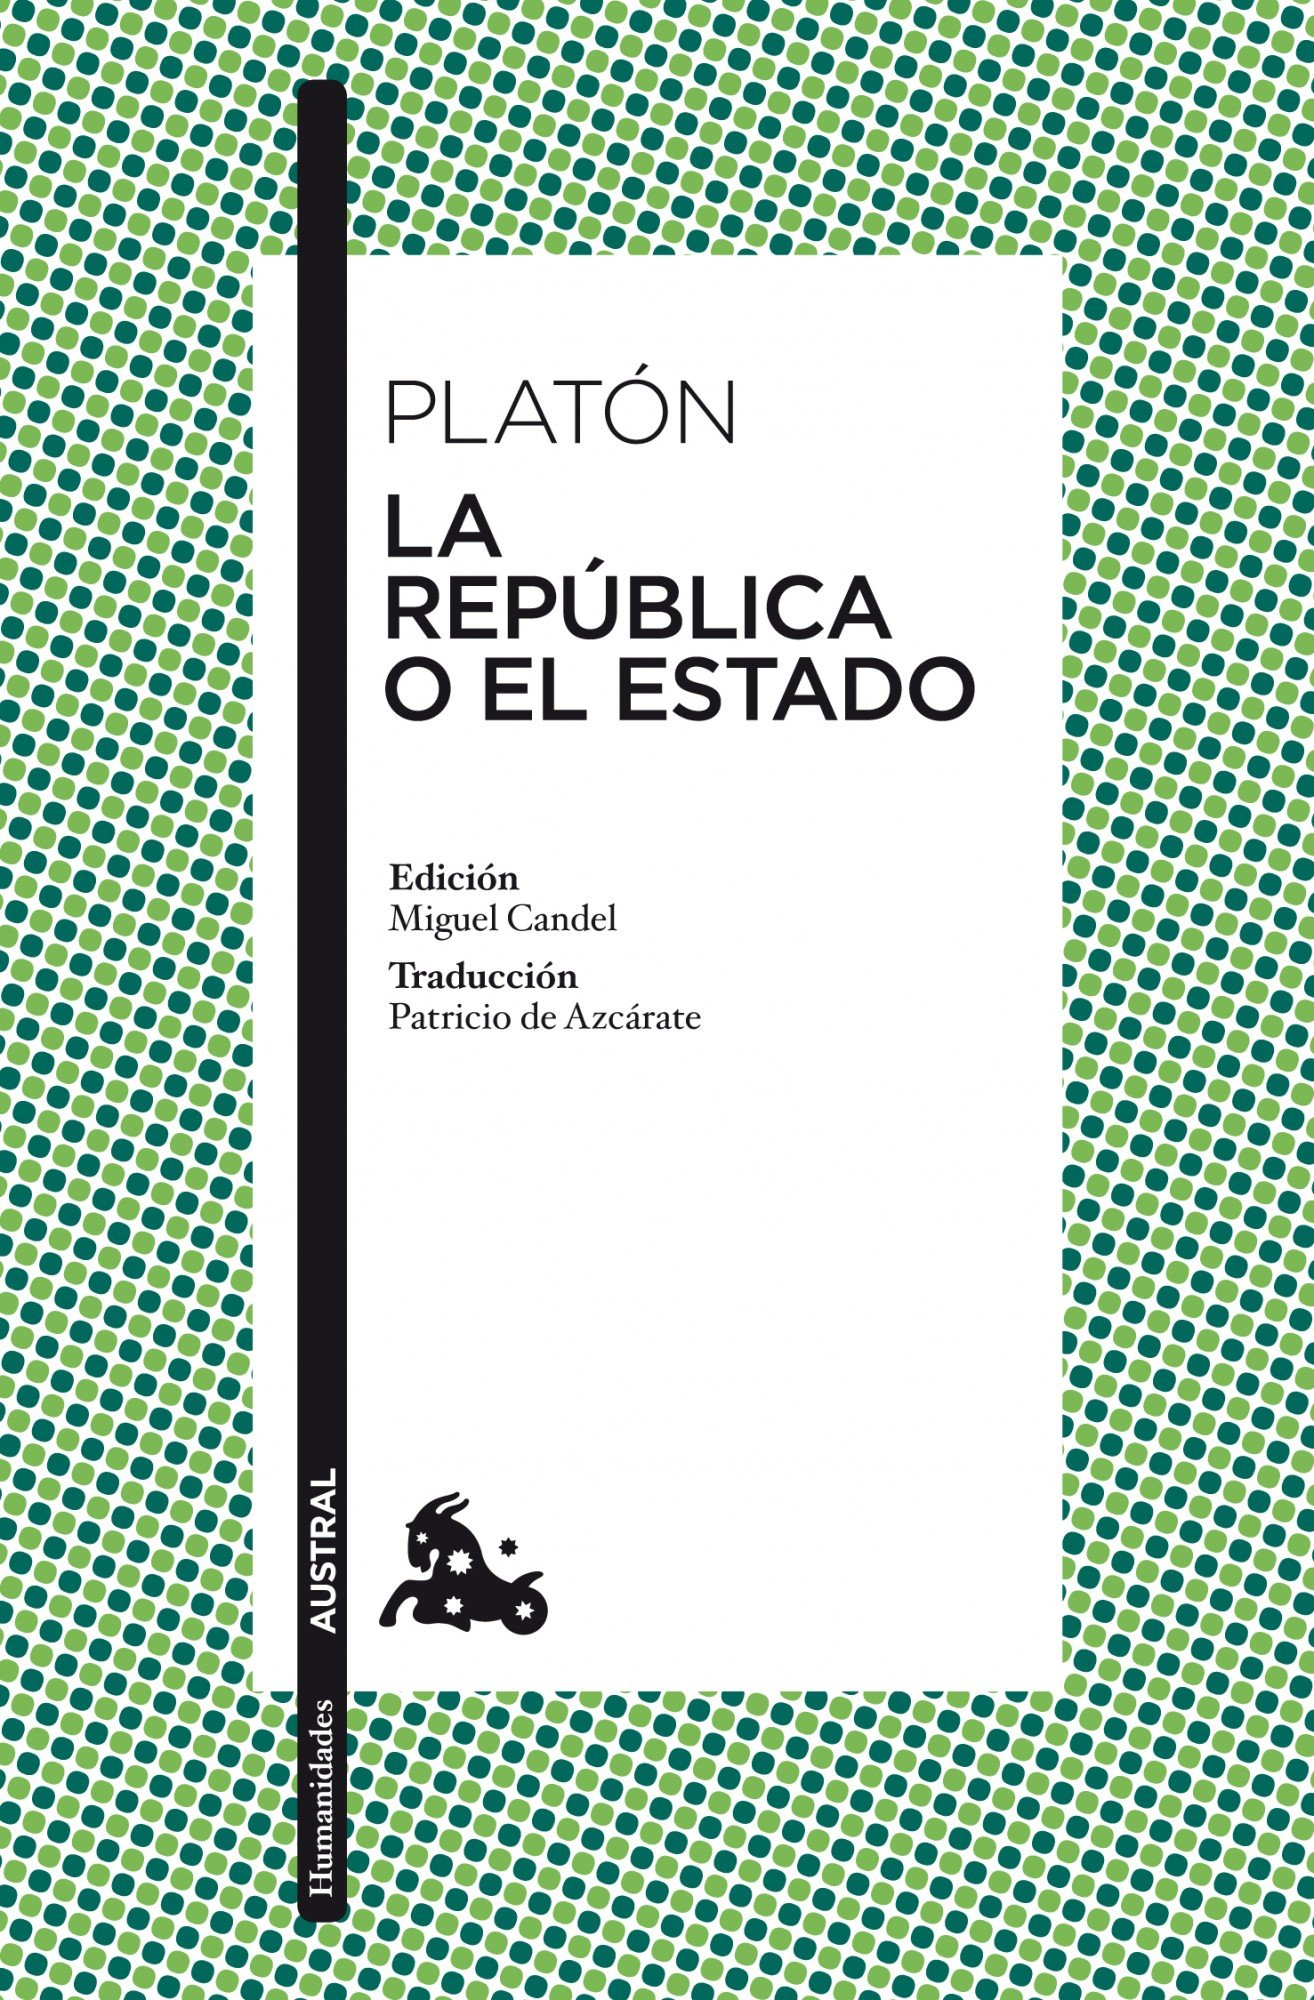 LA REPUBLICA O EL ESTADO Nê296 *11*AUSTR (Humanidades, Band 1)